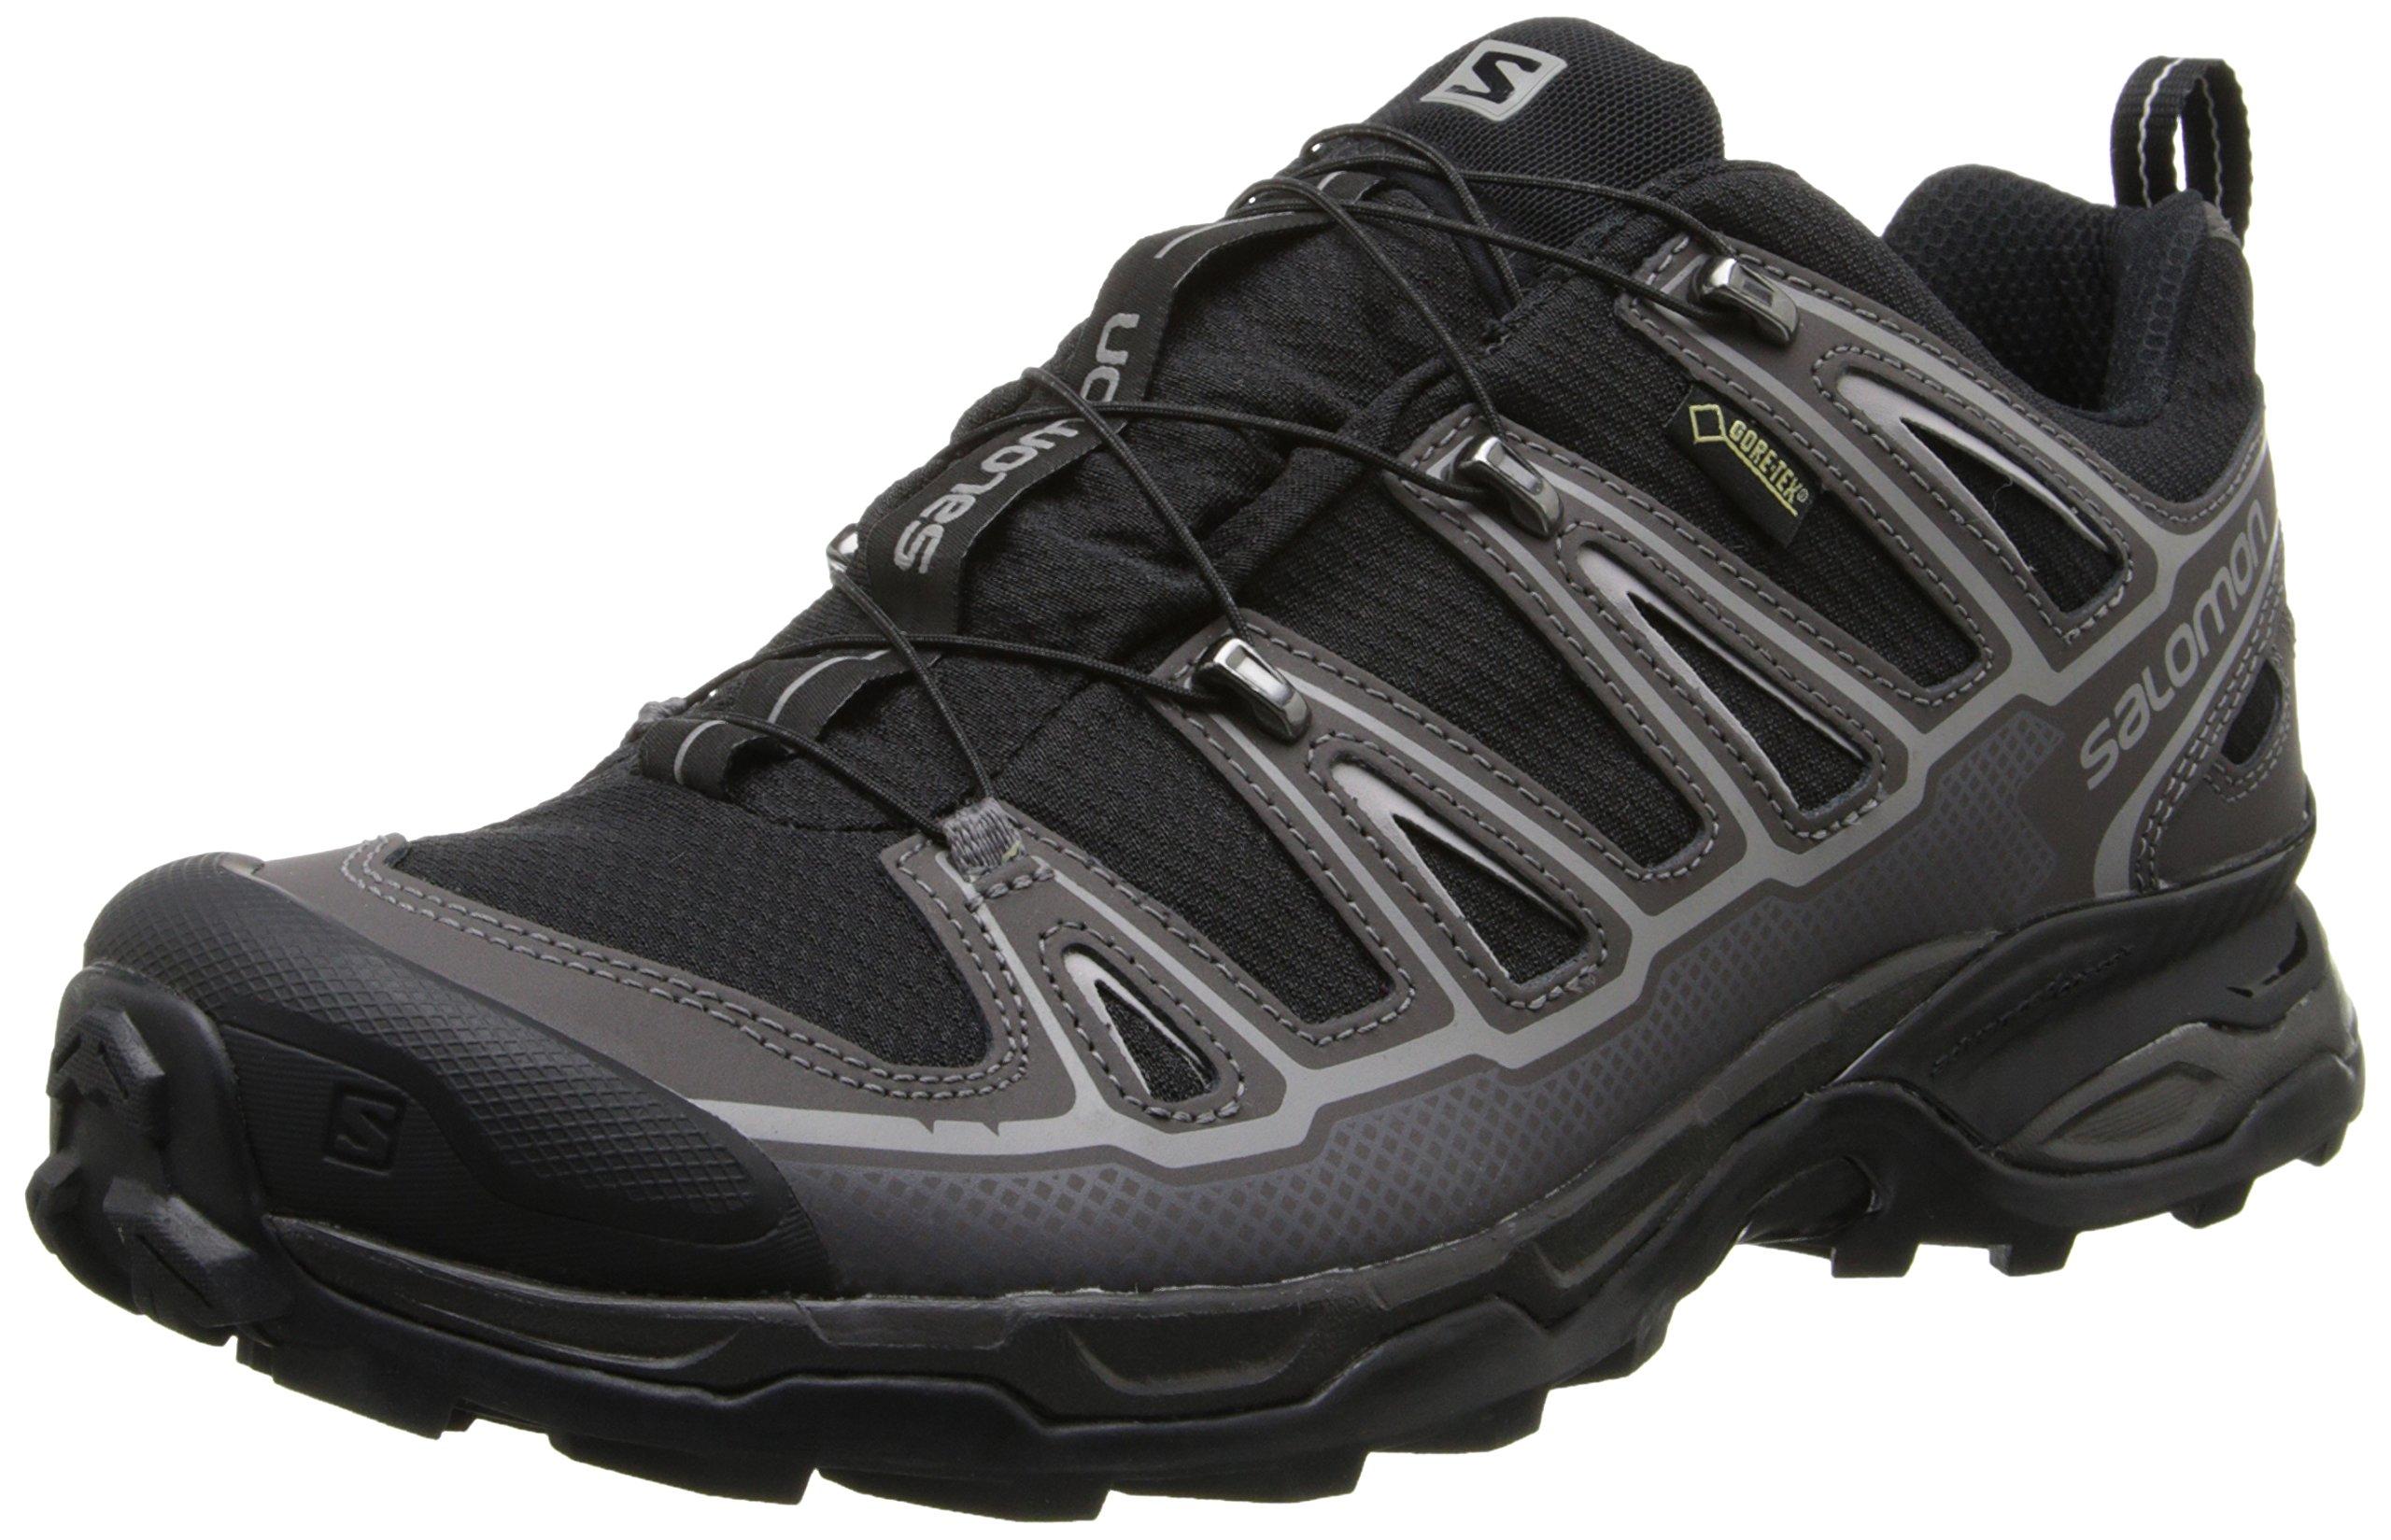 Salomon Men's X Ultra 2 GTX Hiking Shoe, Black/Autobahn/Aluminum, 7 M US